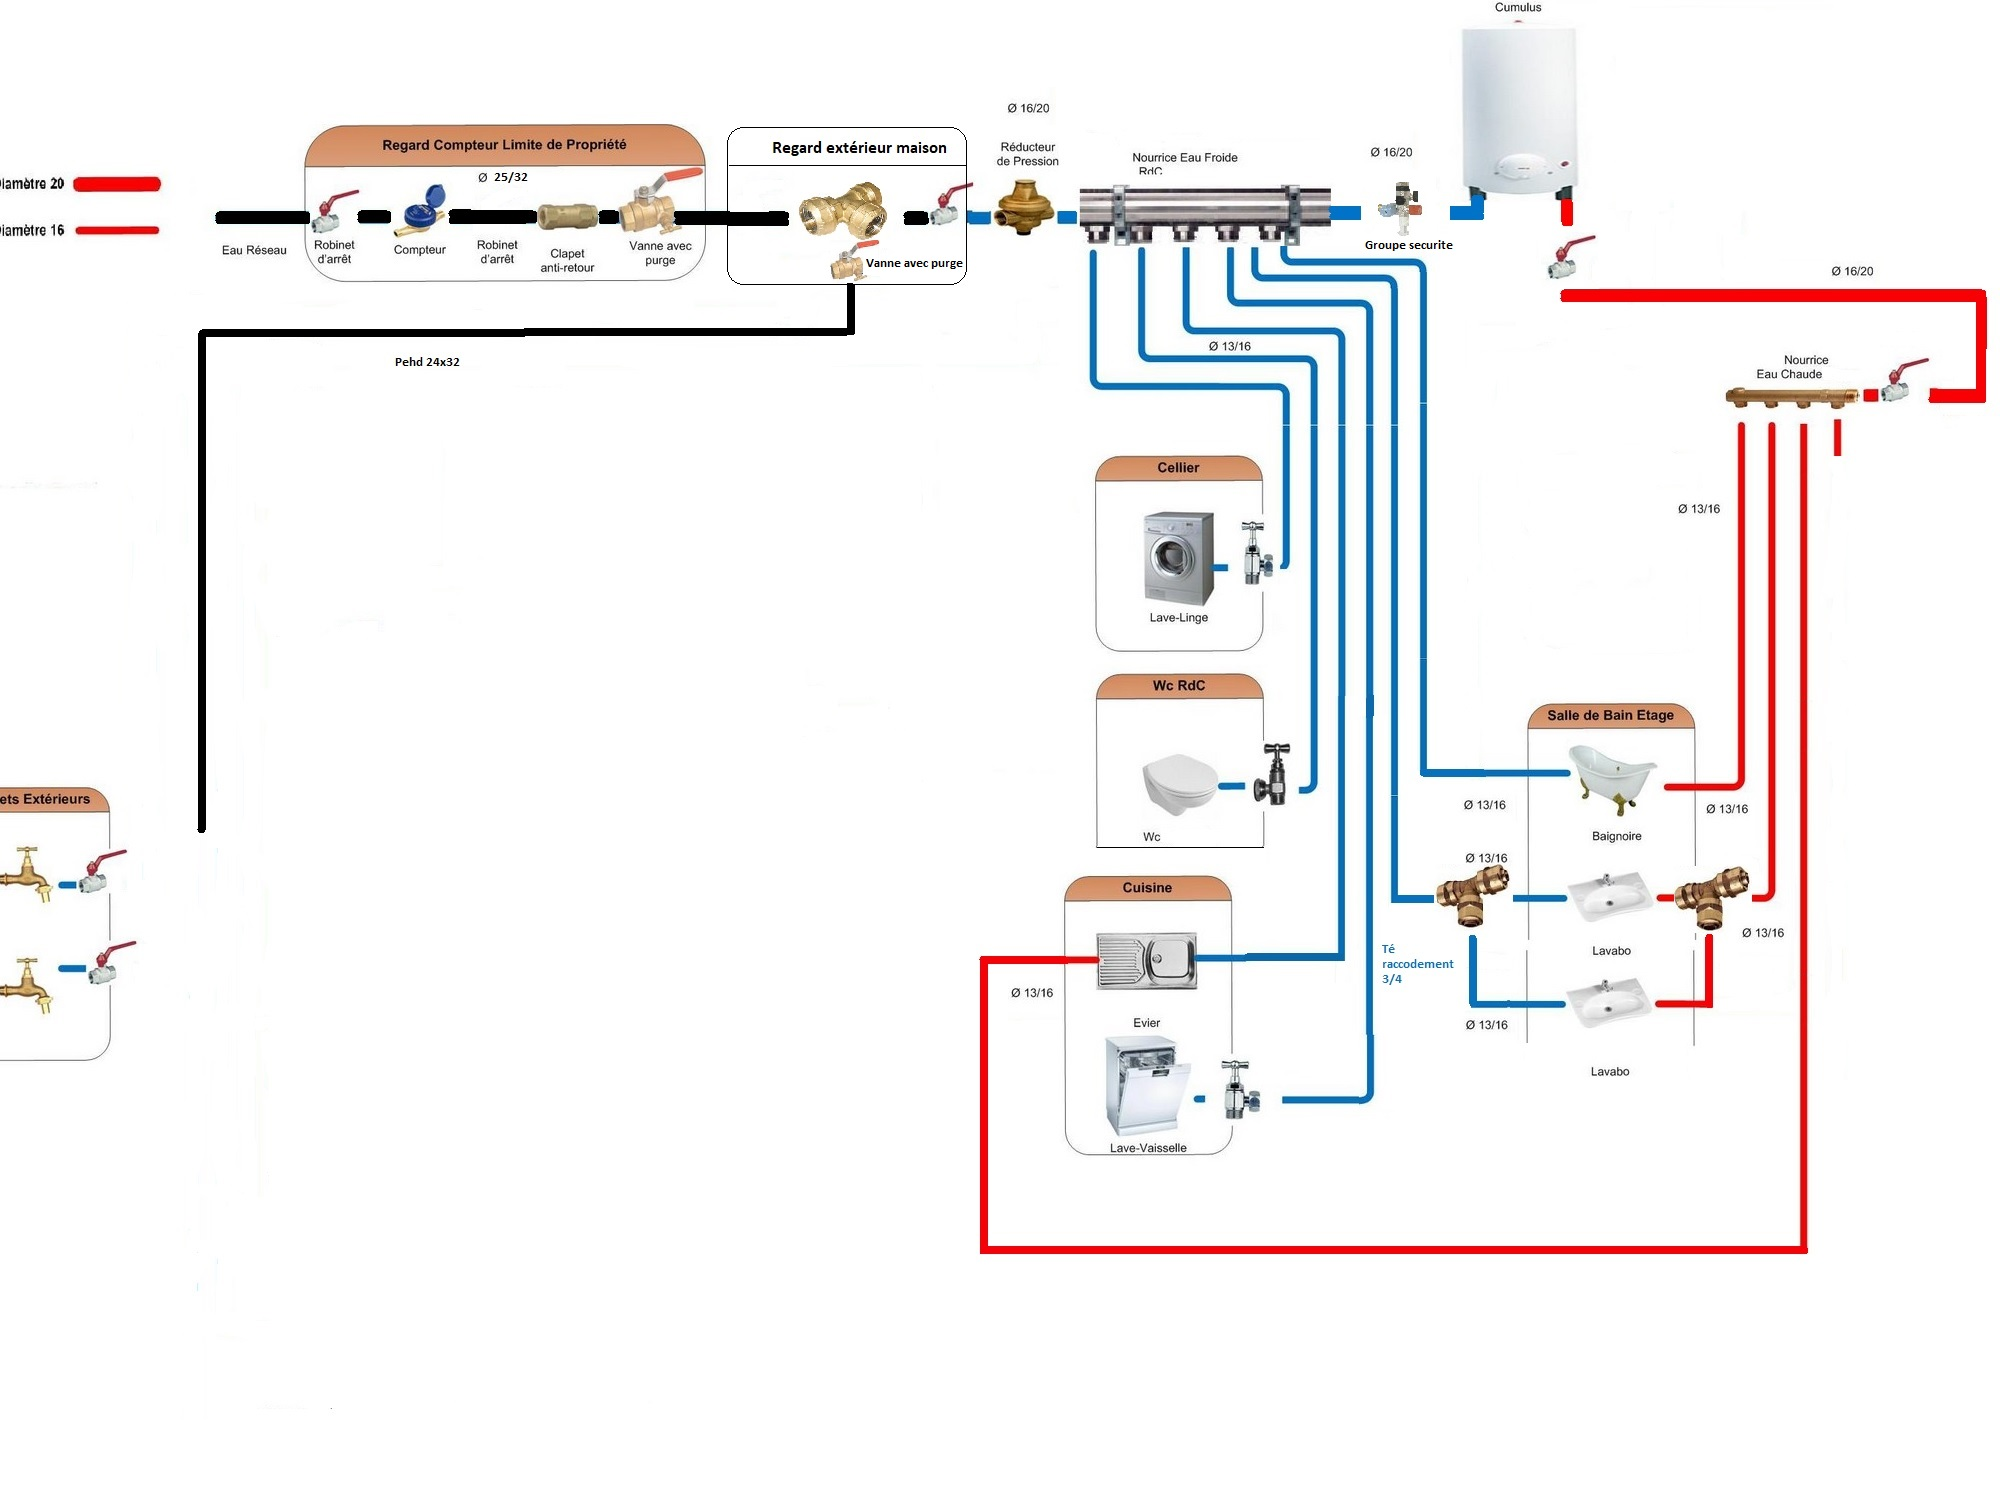 schéma plomberie per .jpg, 265.83 kb, 2000 x 1500